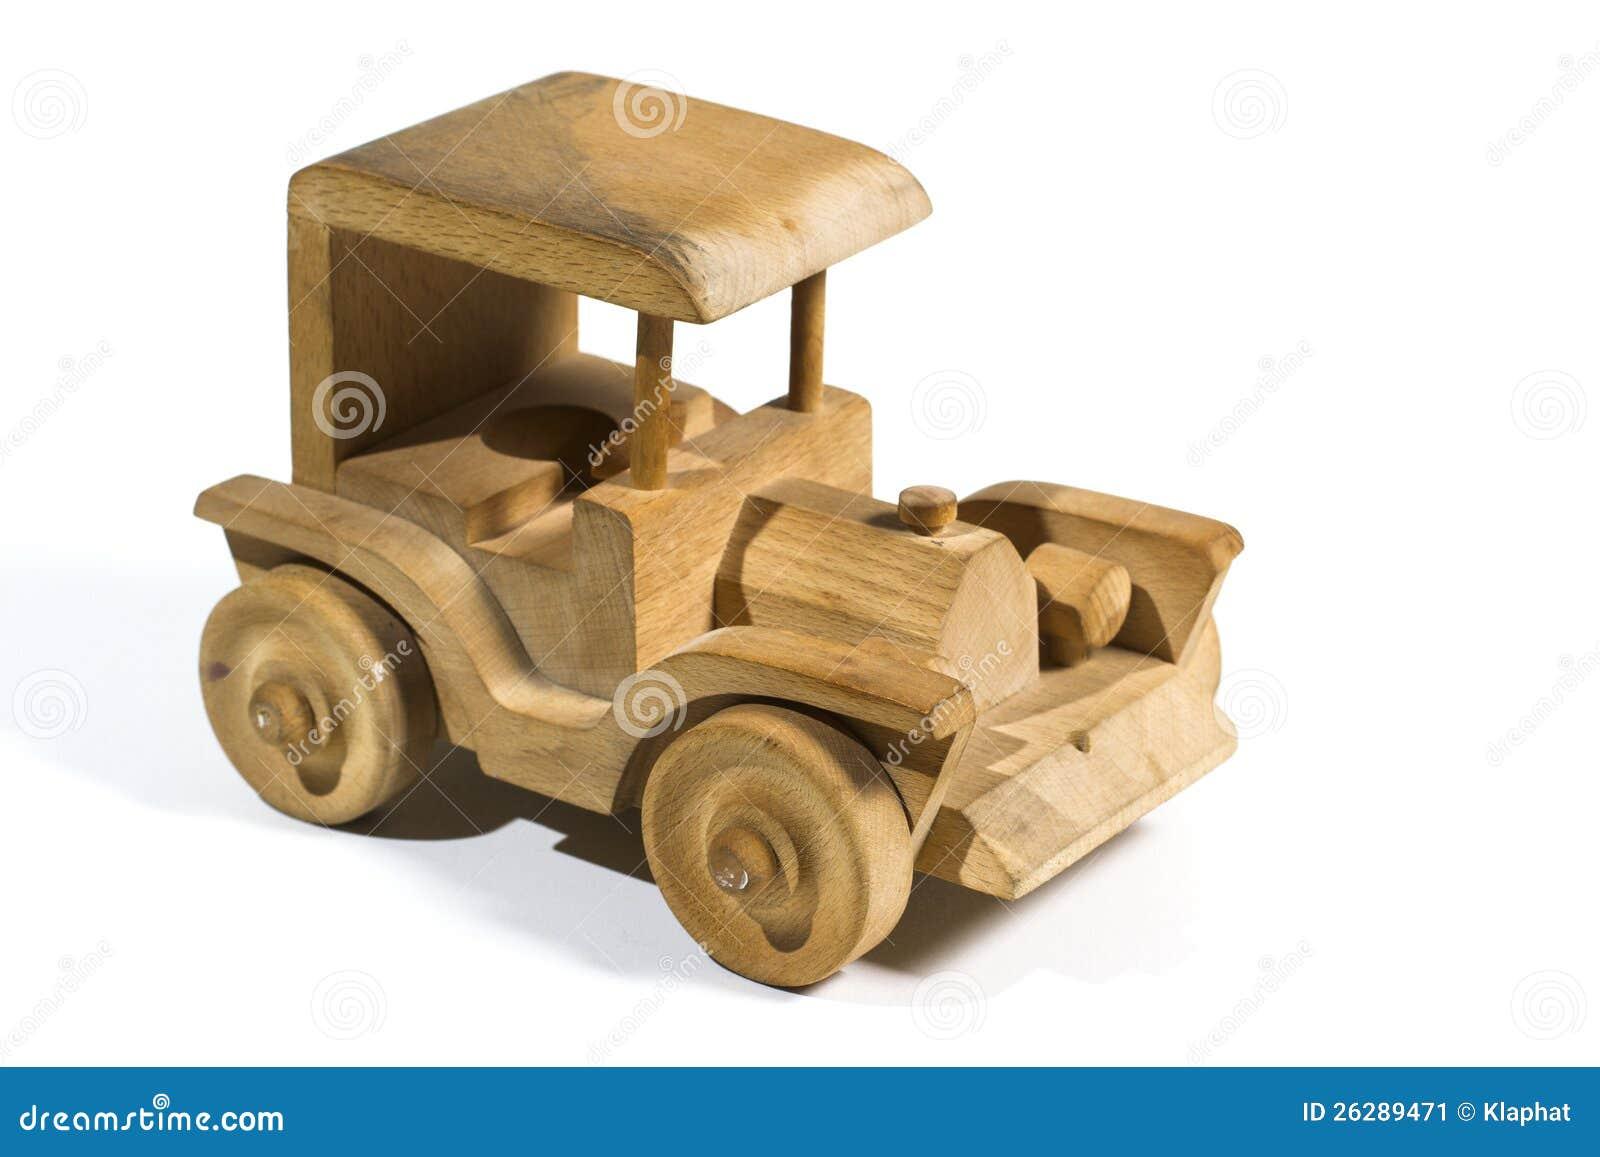 make wood toy trucks